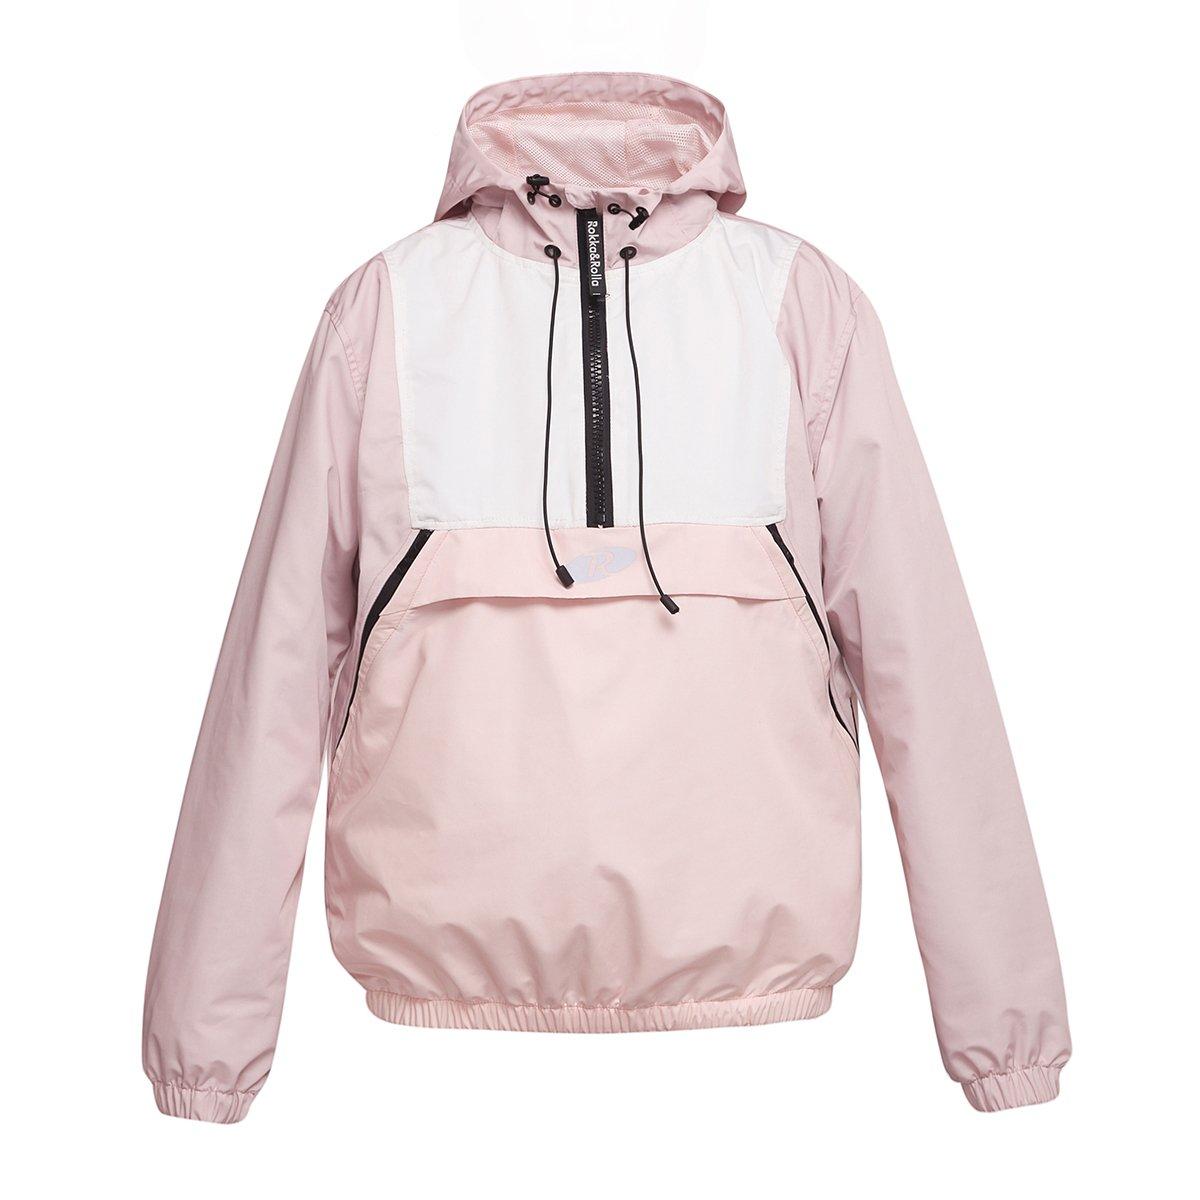 Rokka&Rolla Women's Athletic Water-Resistant Hooded Windbreaker Pullover Anorak Jacket